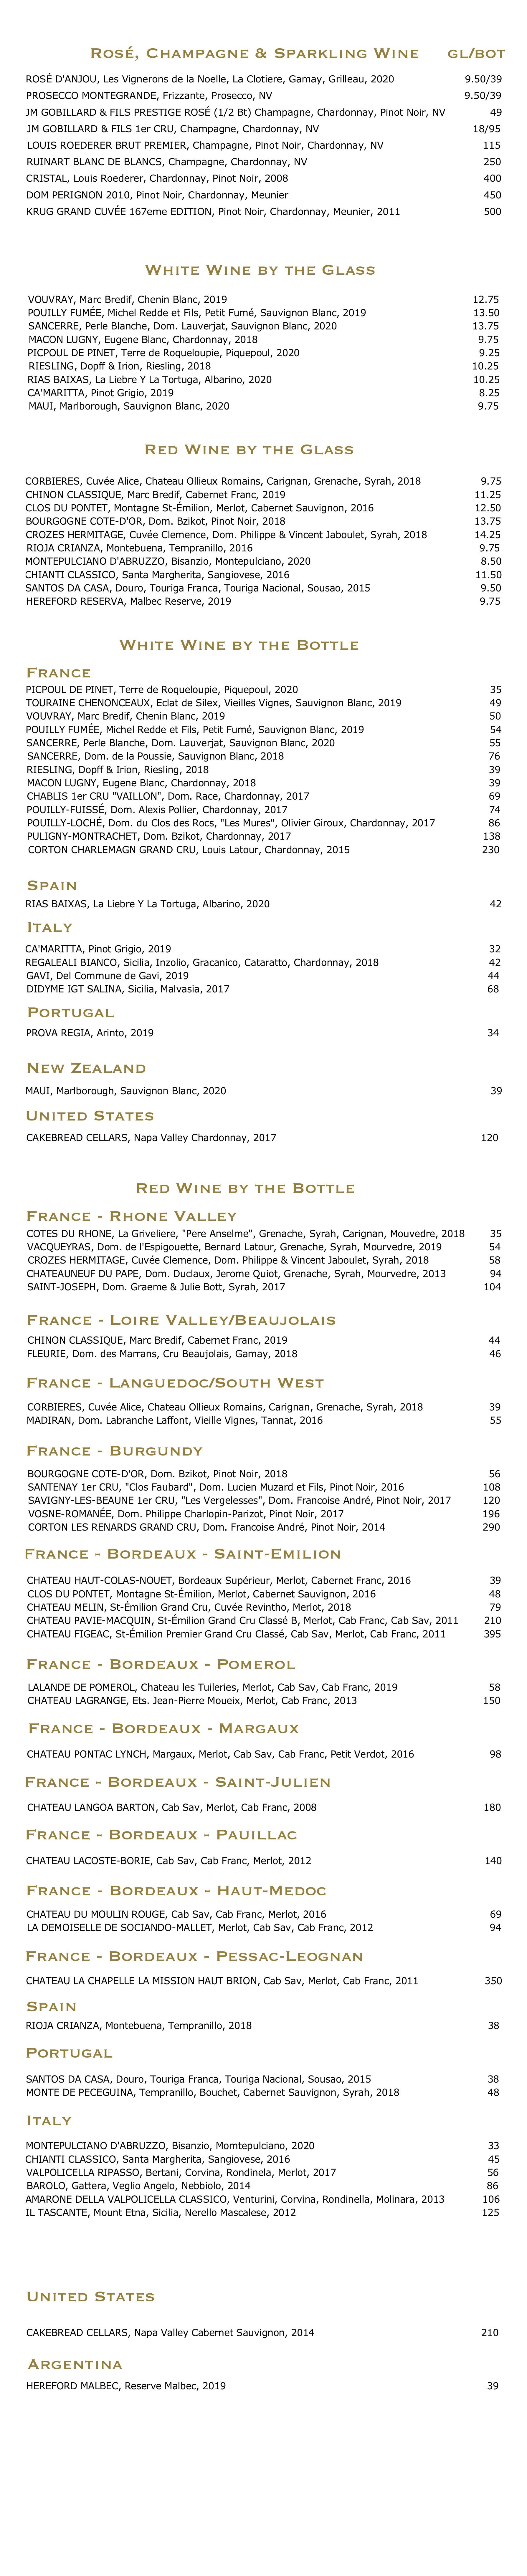 new wine list test